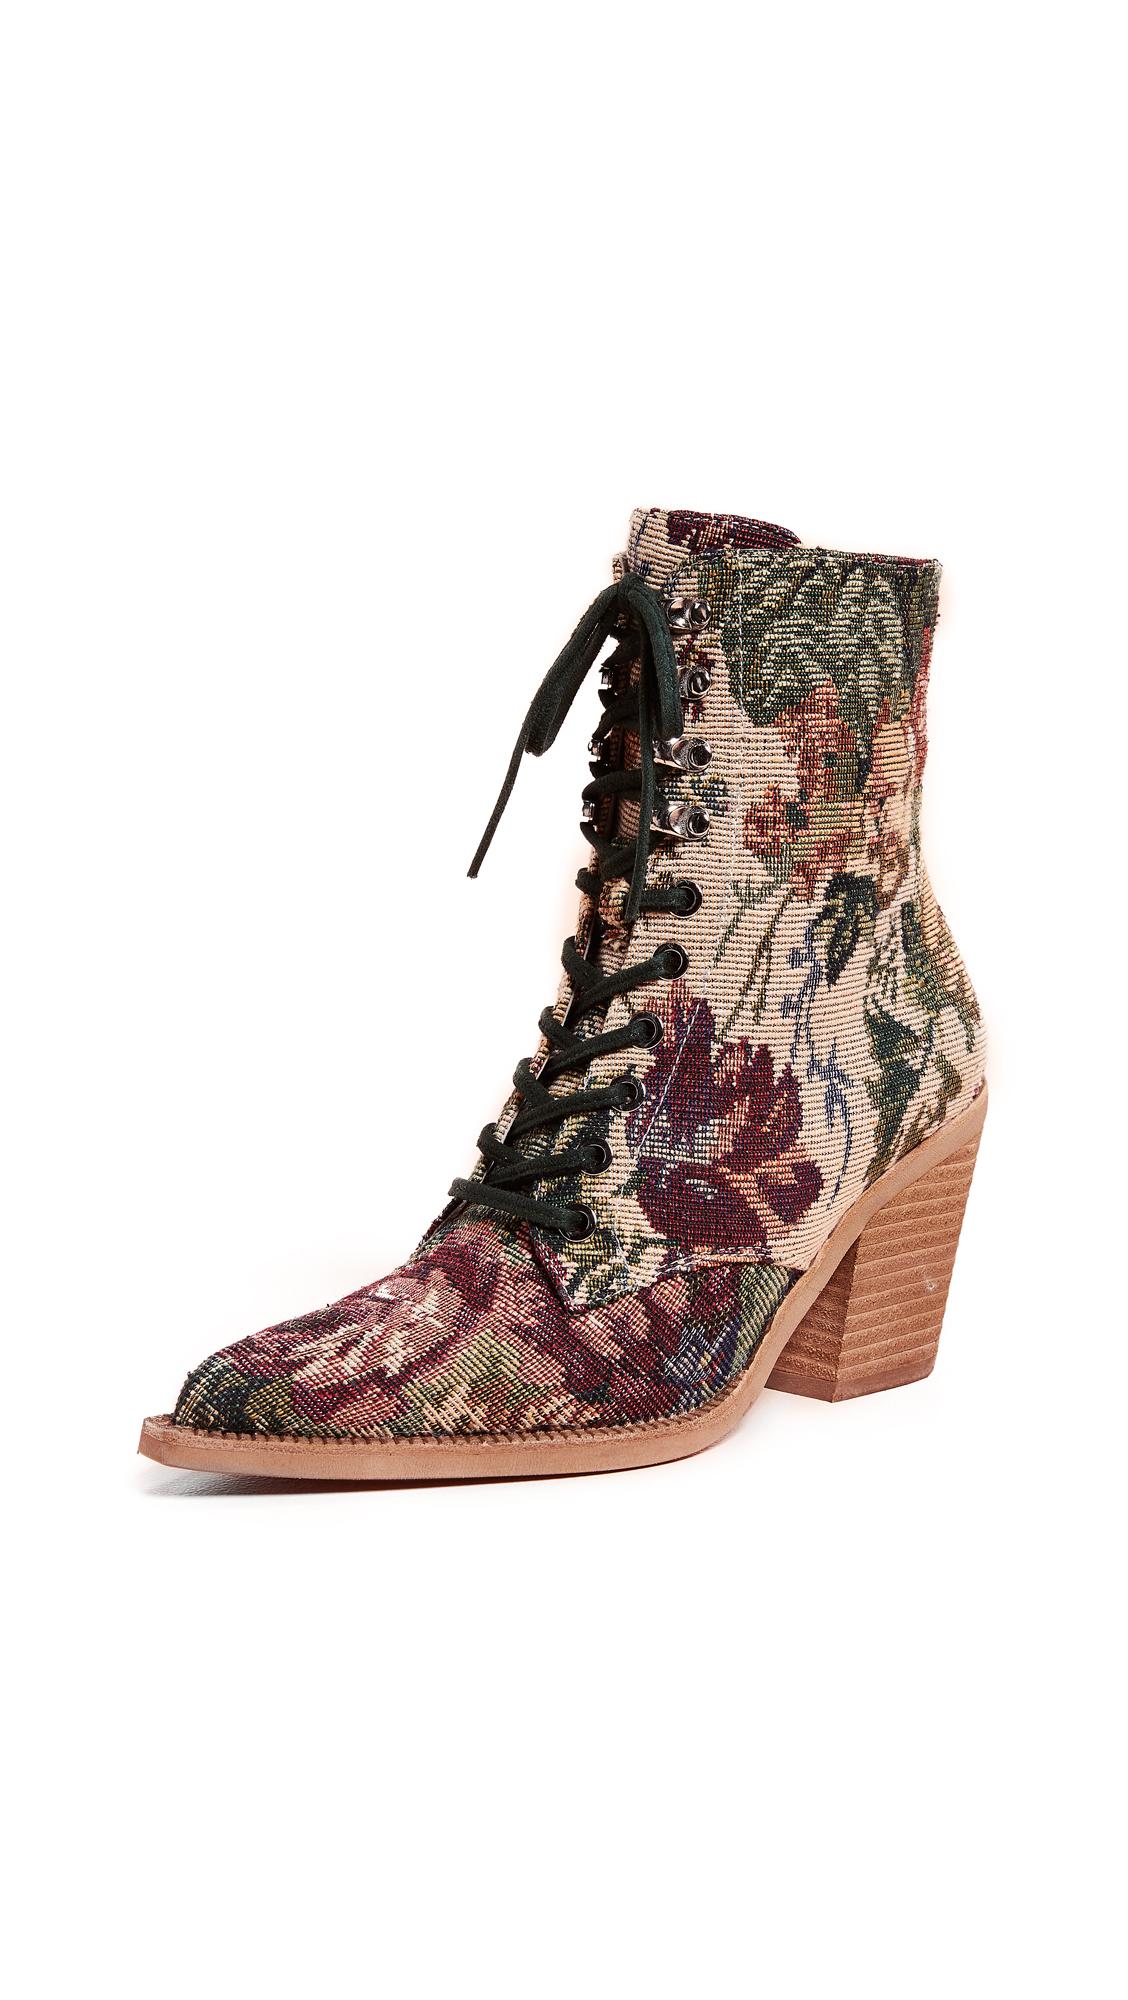 Jeffrey Campbell Elmace Lace Up Boots - Beige/Pink Floral